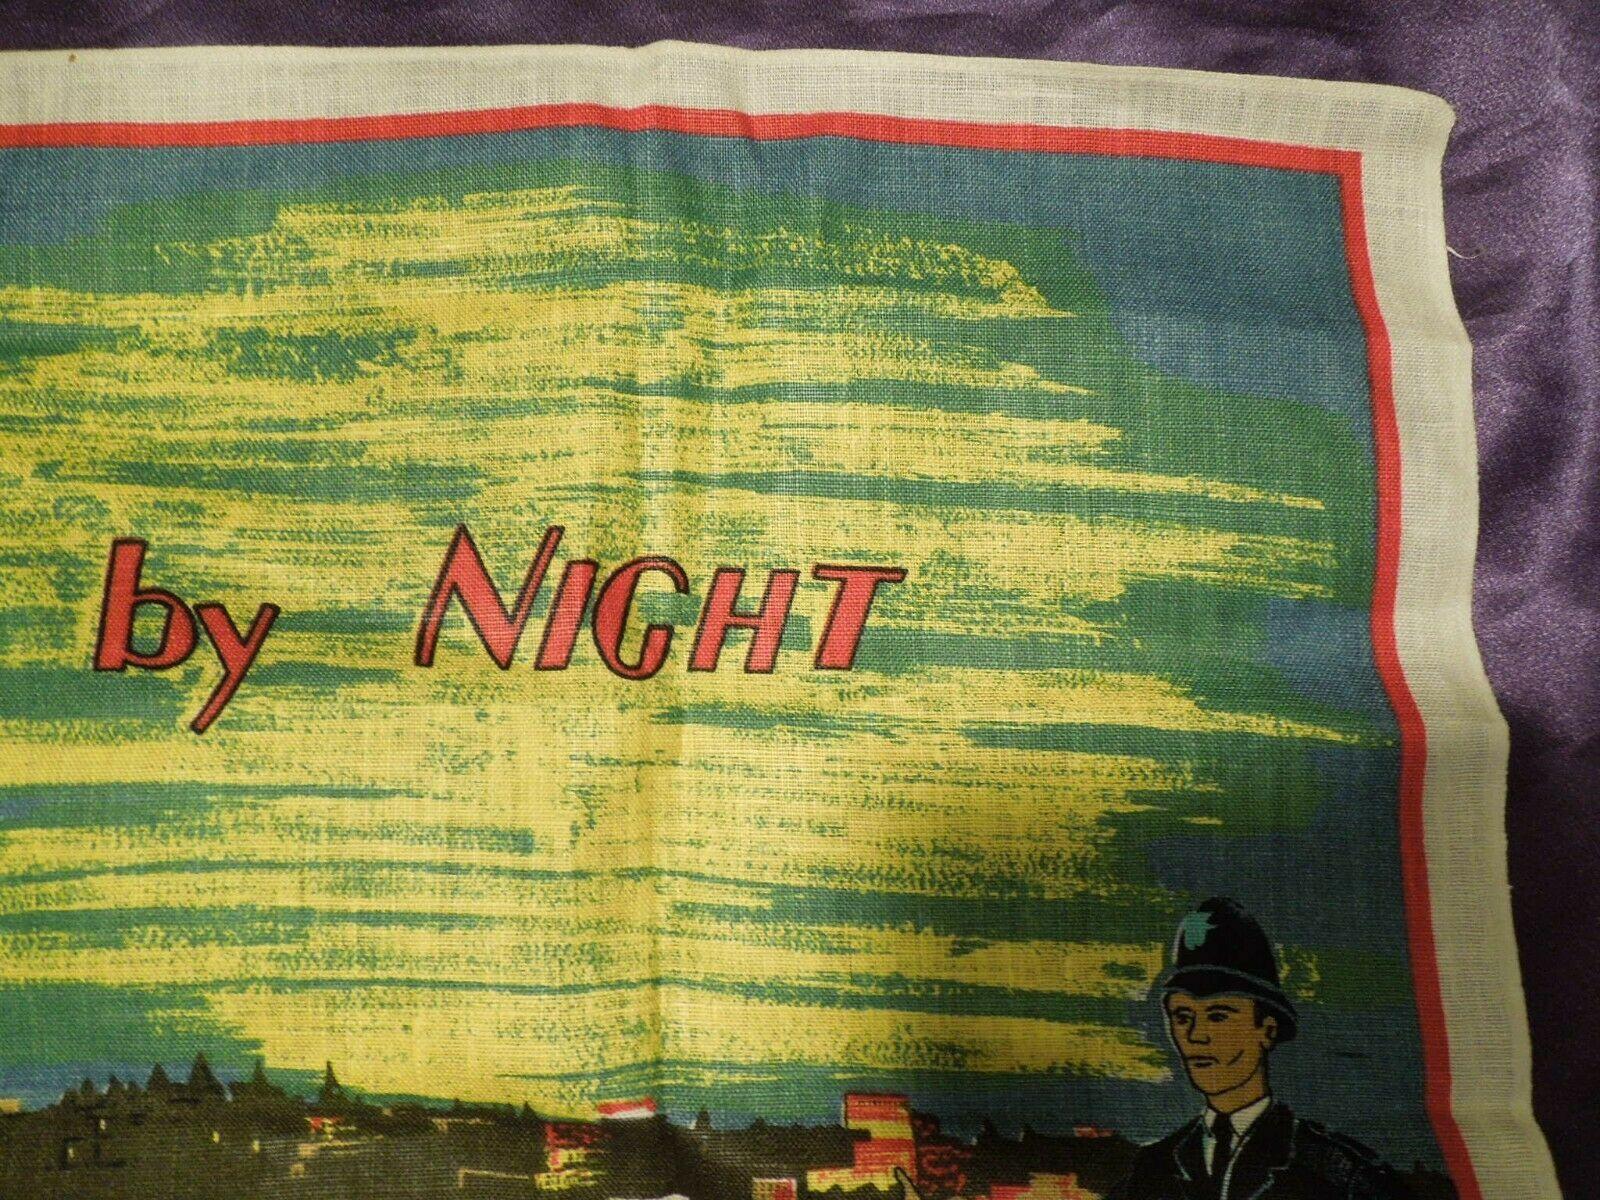 Vintage London by Night by Blackstaff Pure Irish Linen Towel Art image 8